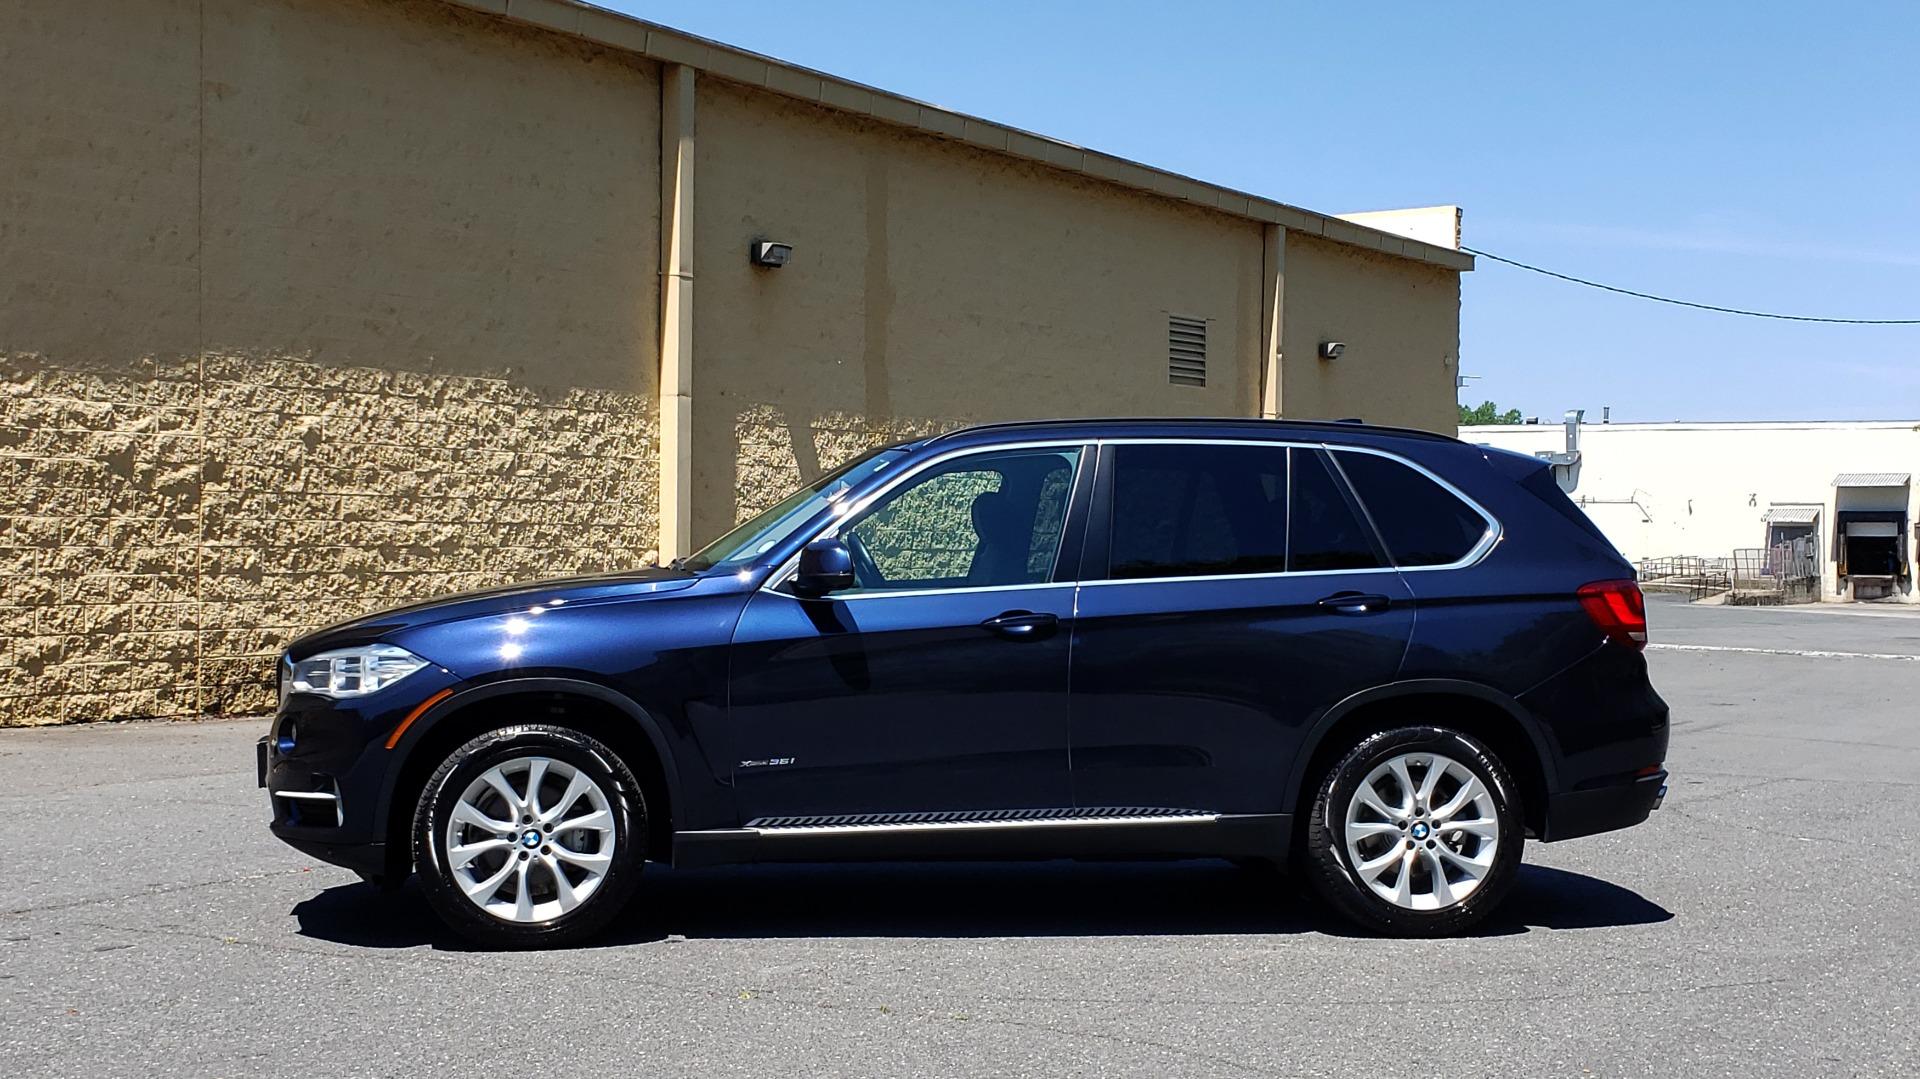 Used 2016 BMW X5 XDRIVE35I / PREM PKG / NAV / DRVR ASST PLUS / REARVIEW for sale $25,765 at Formula Imports in Charlotte NC 28227 2